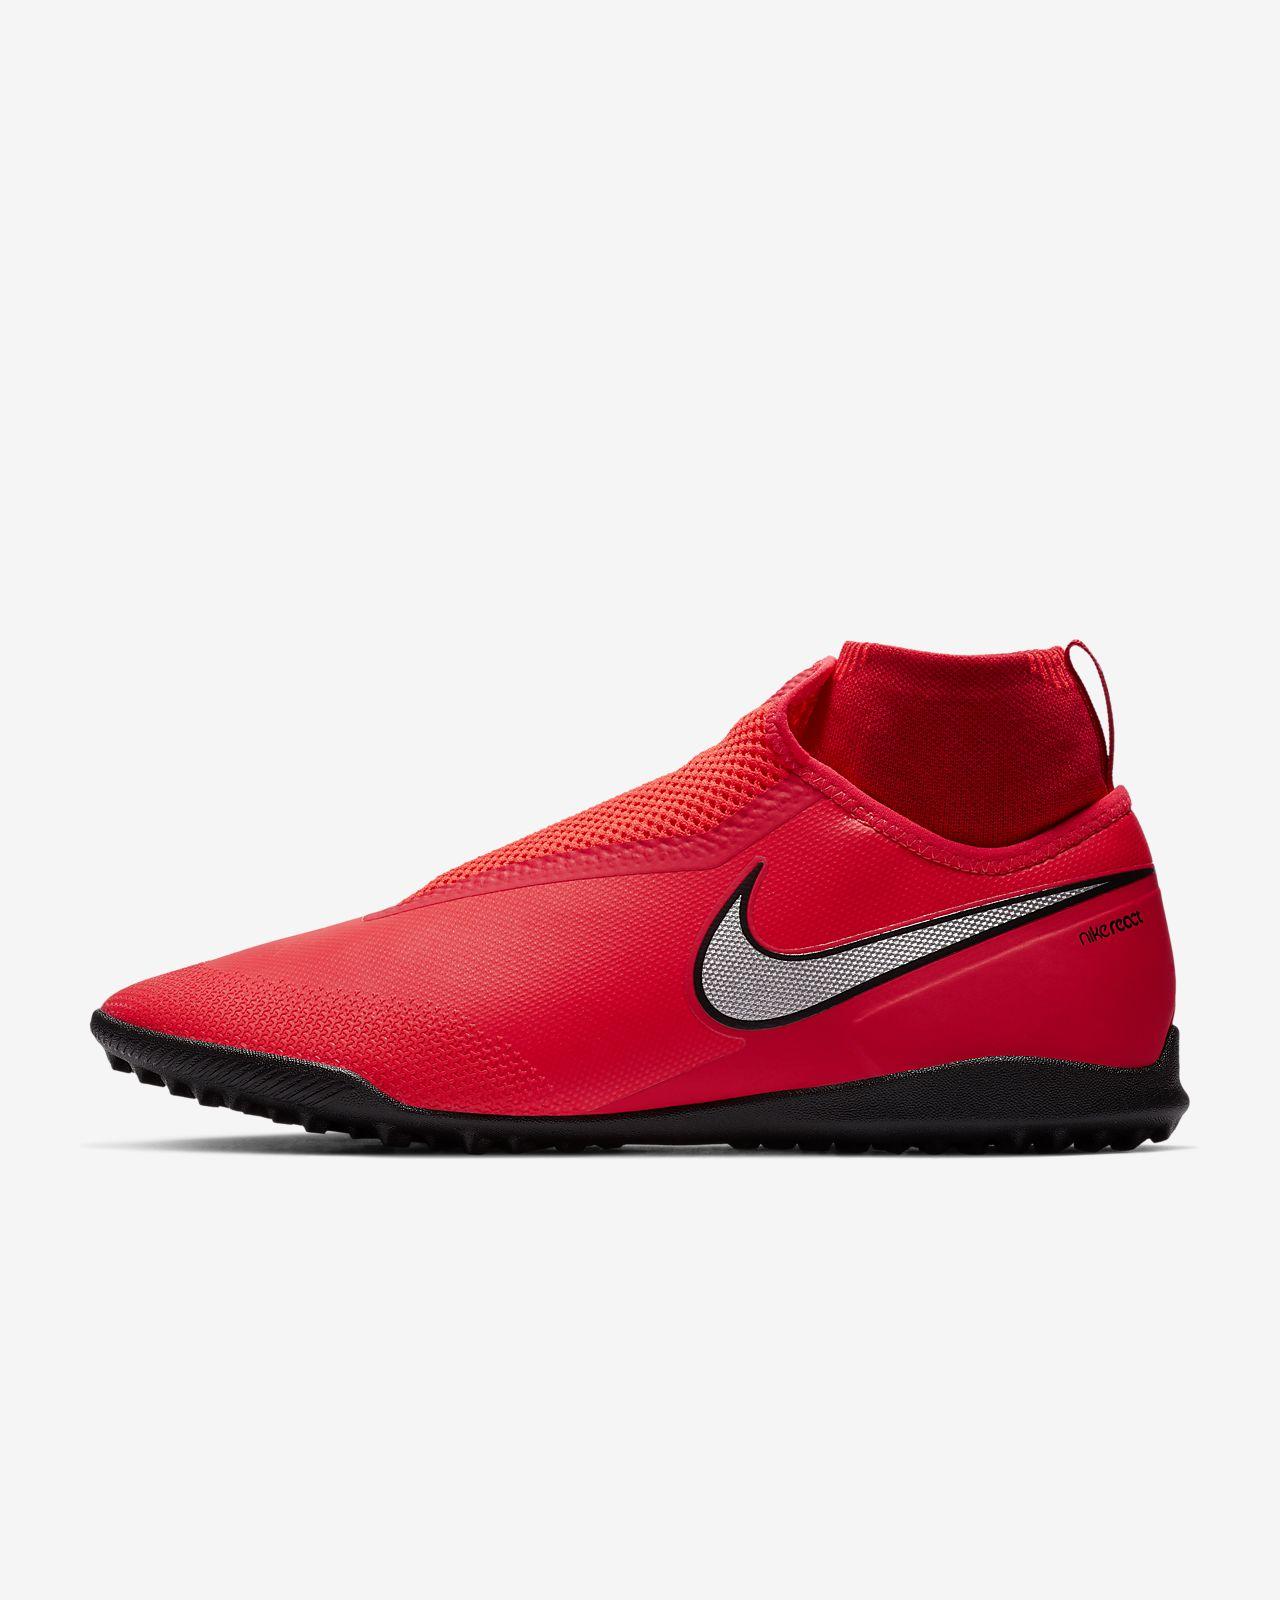 ... Scarpa da calcio per erba sintetica Nike React PhantomVSN Pro Dynamic  Fit Game Over TF 29210e9c788